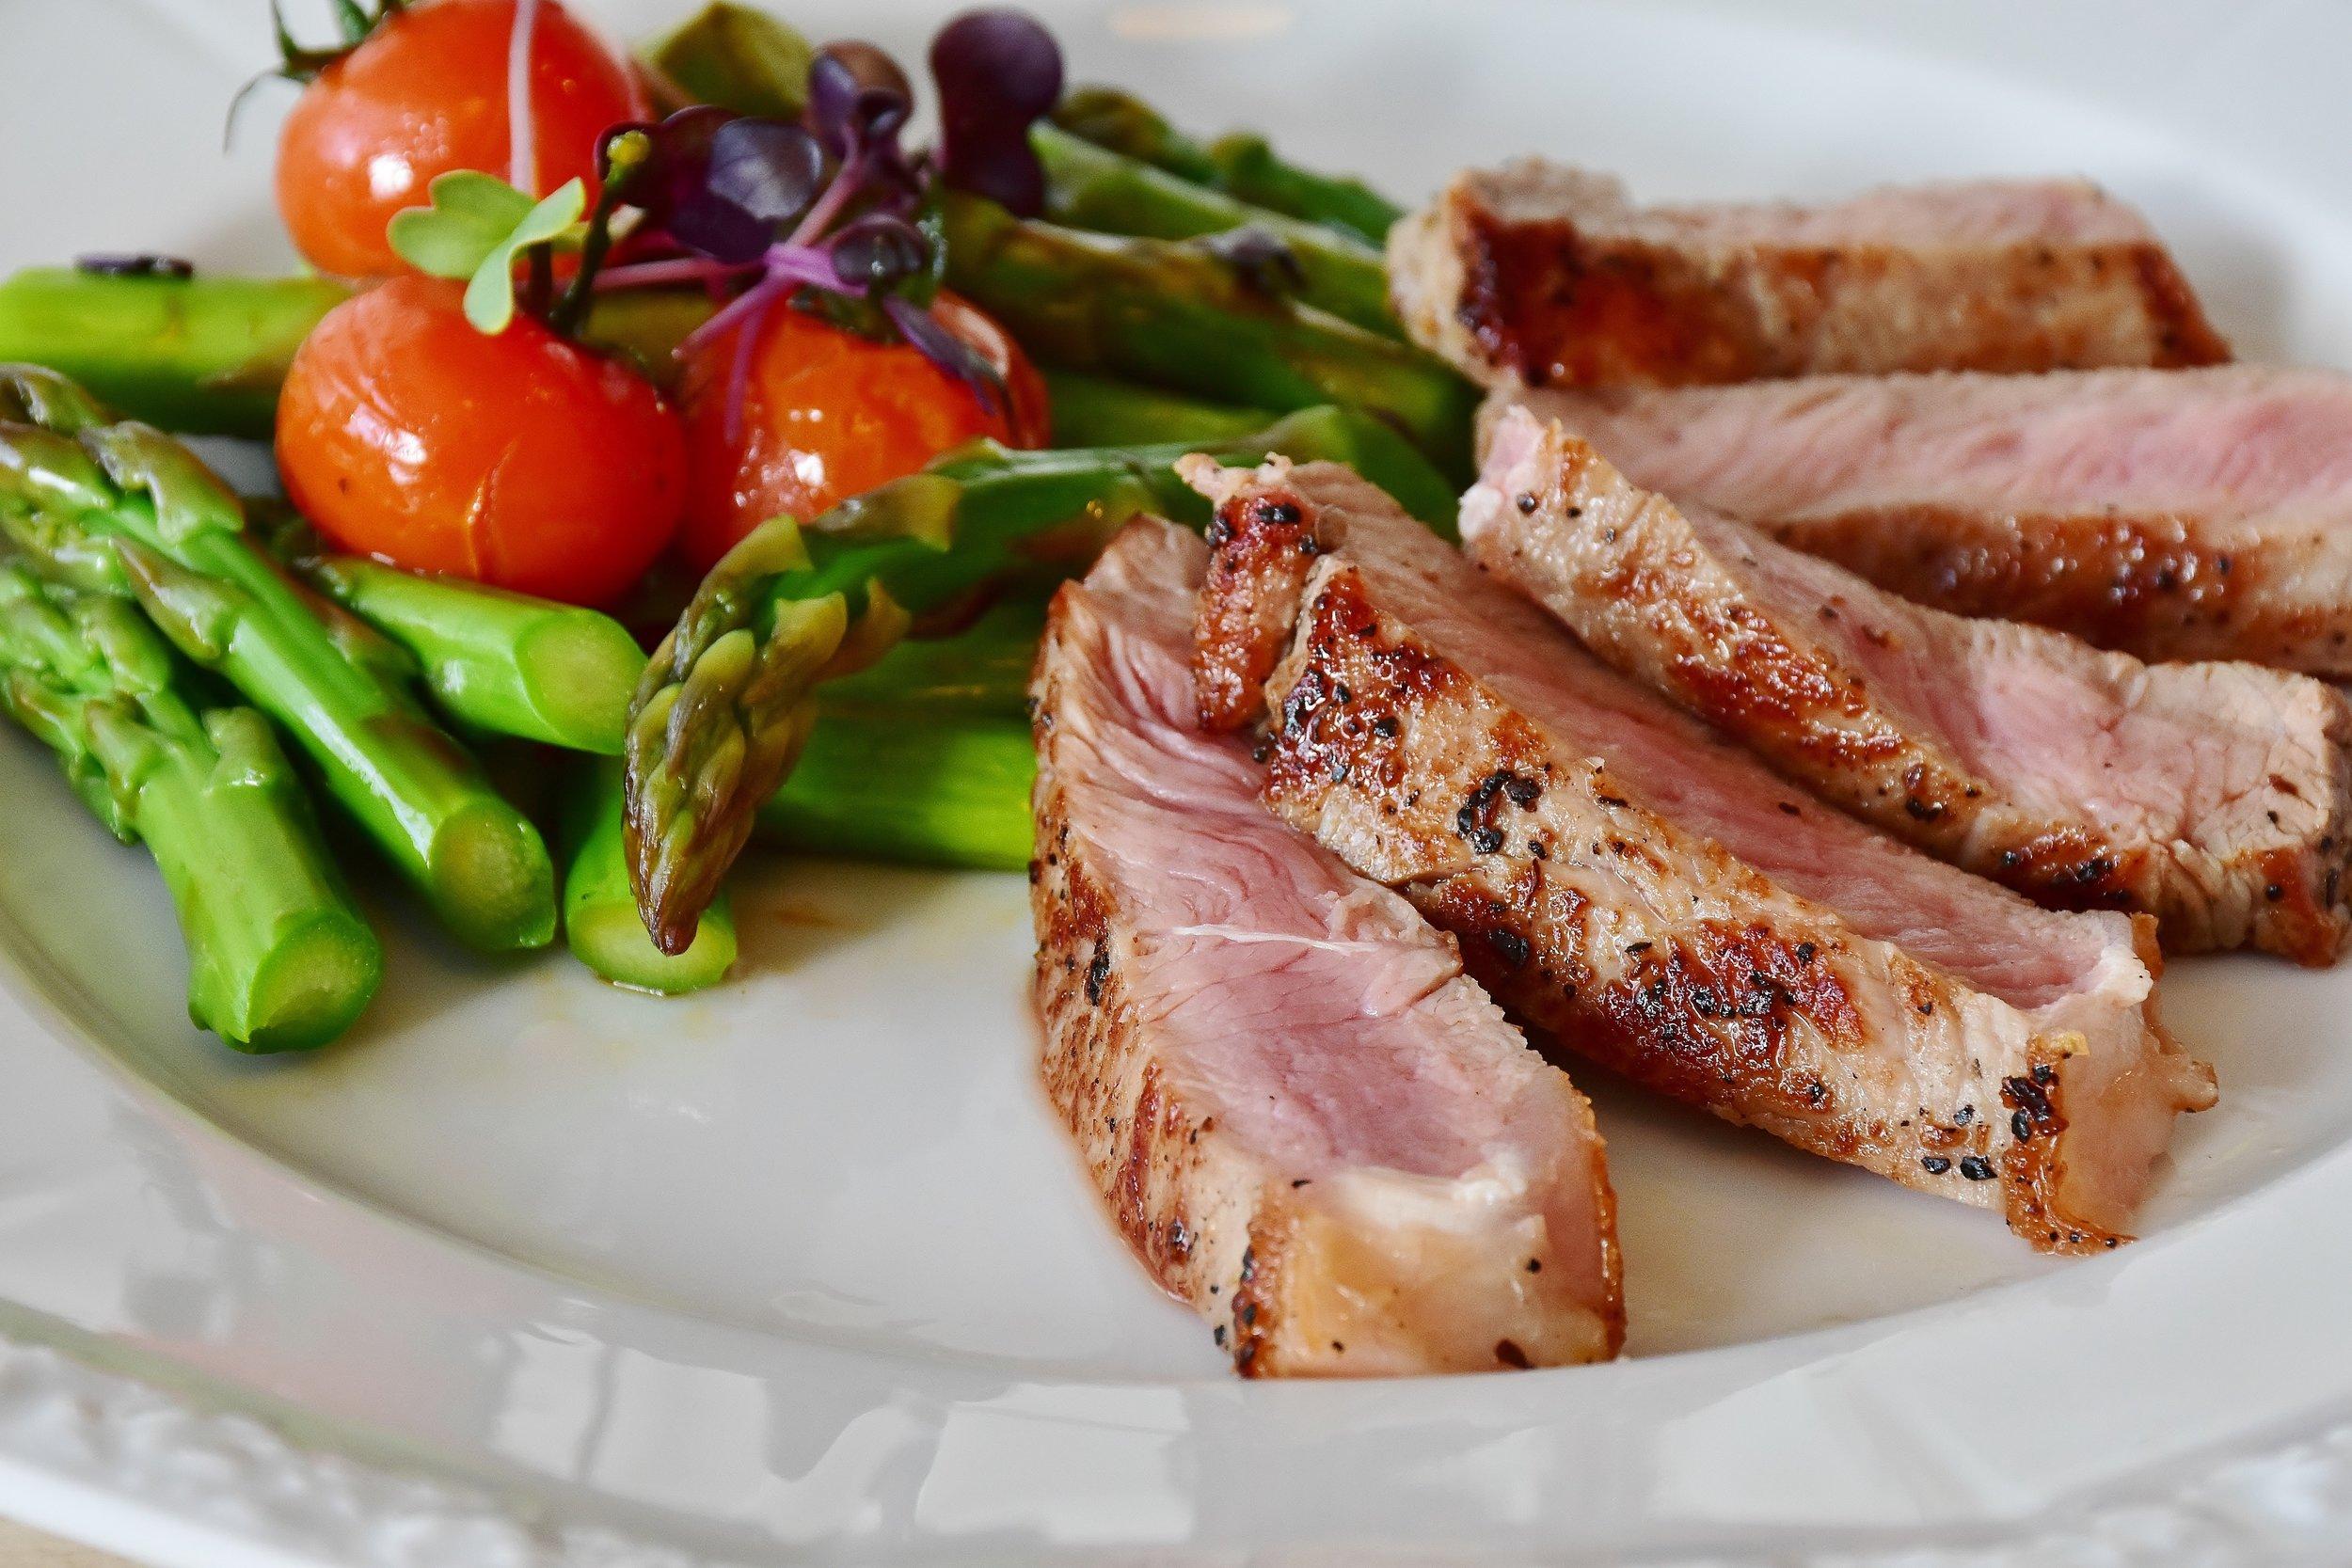 asparagus-barbecue-beef-361184.jpg